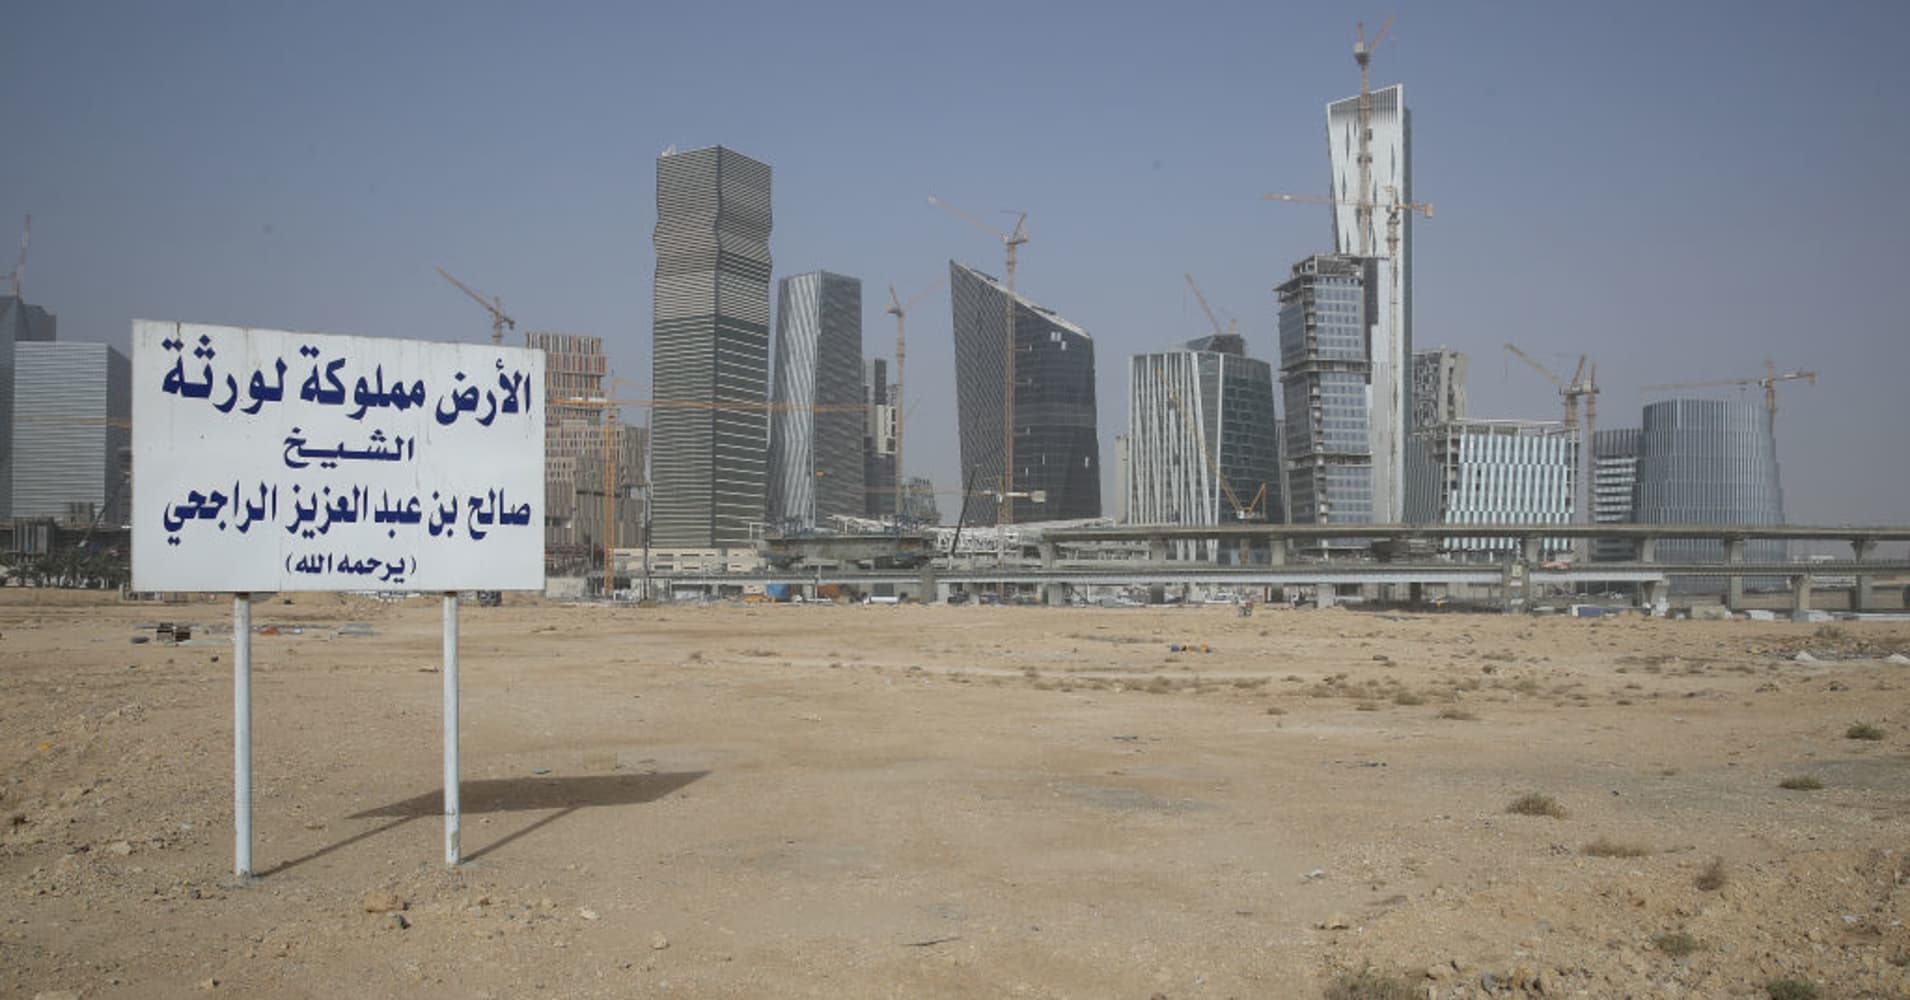 Saudi Arabia is stumbling in effort to build global financial center